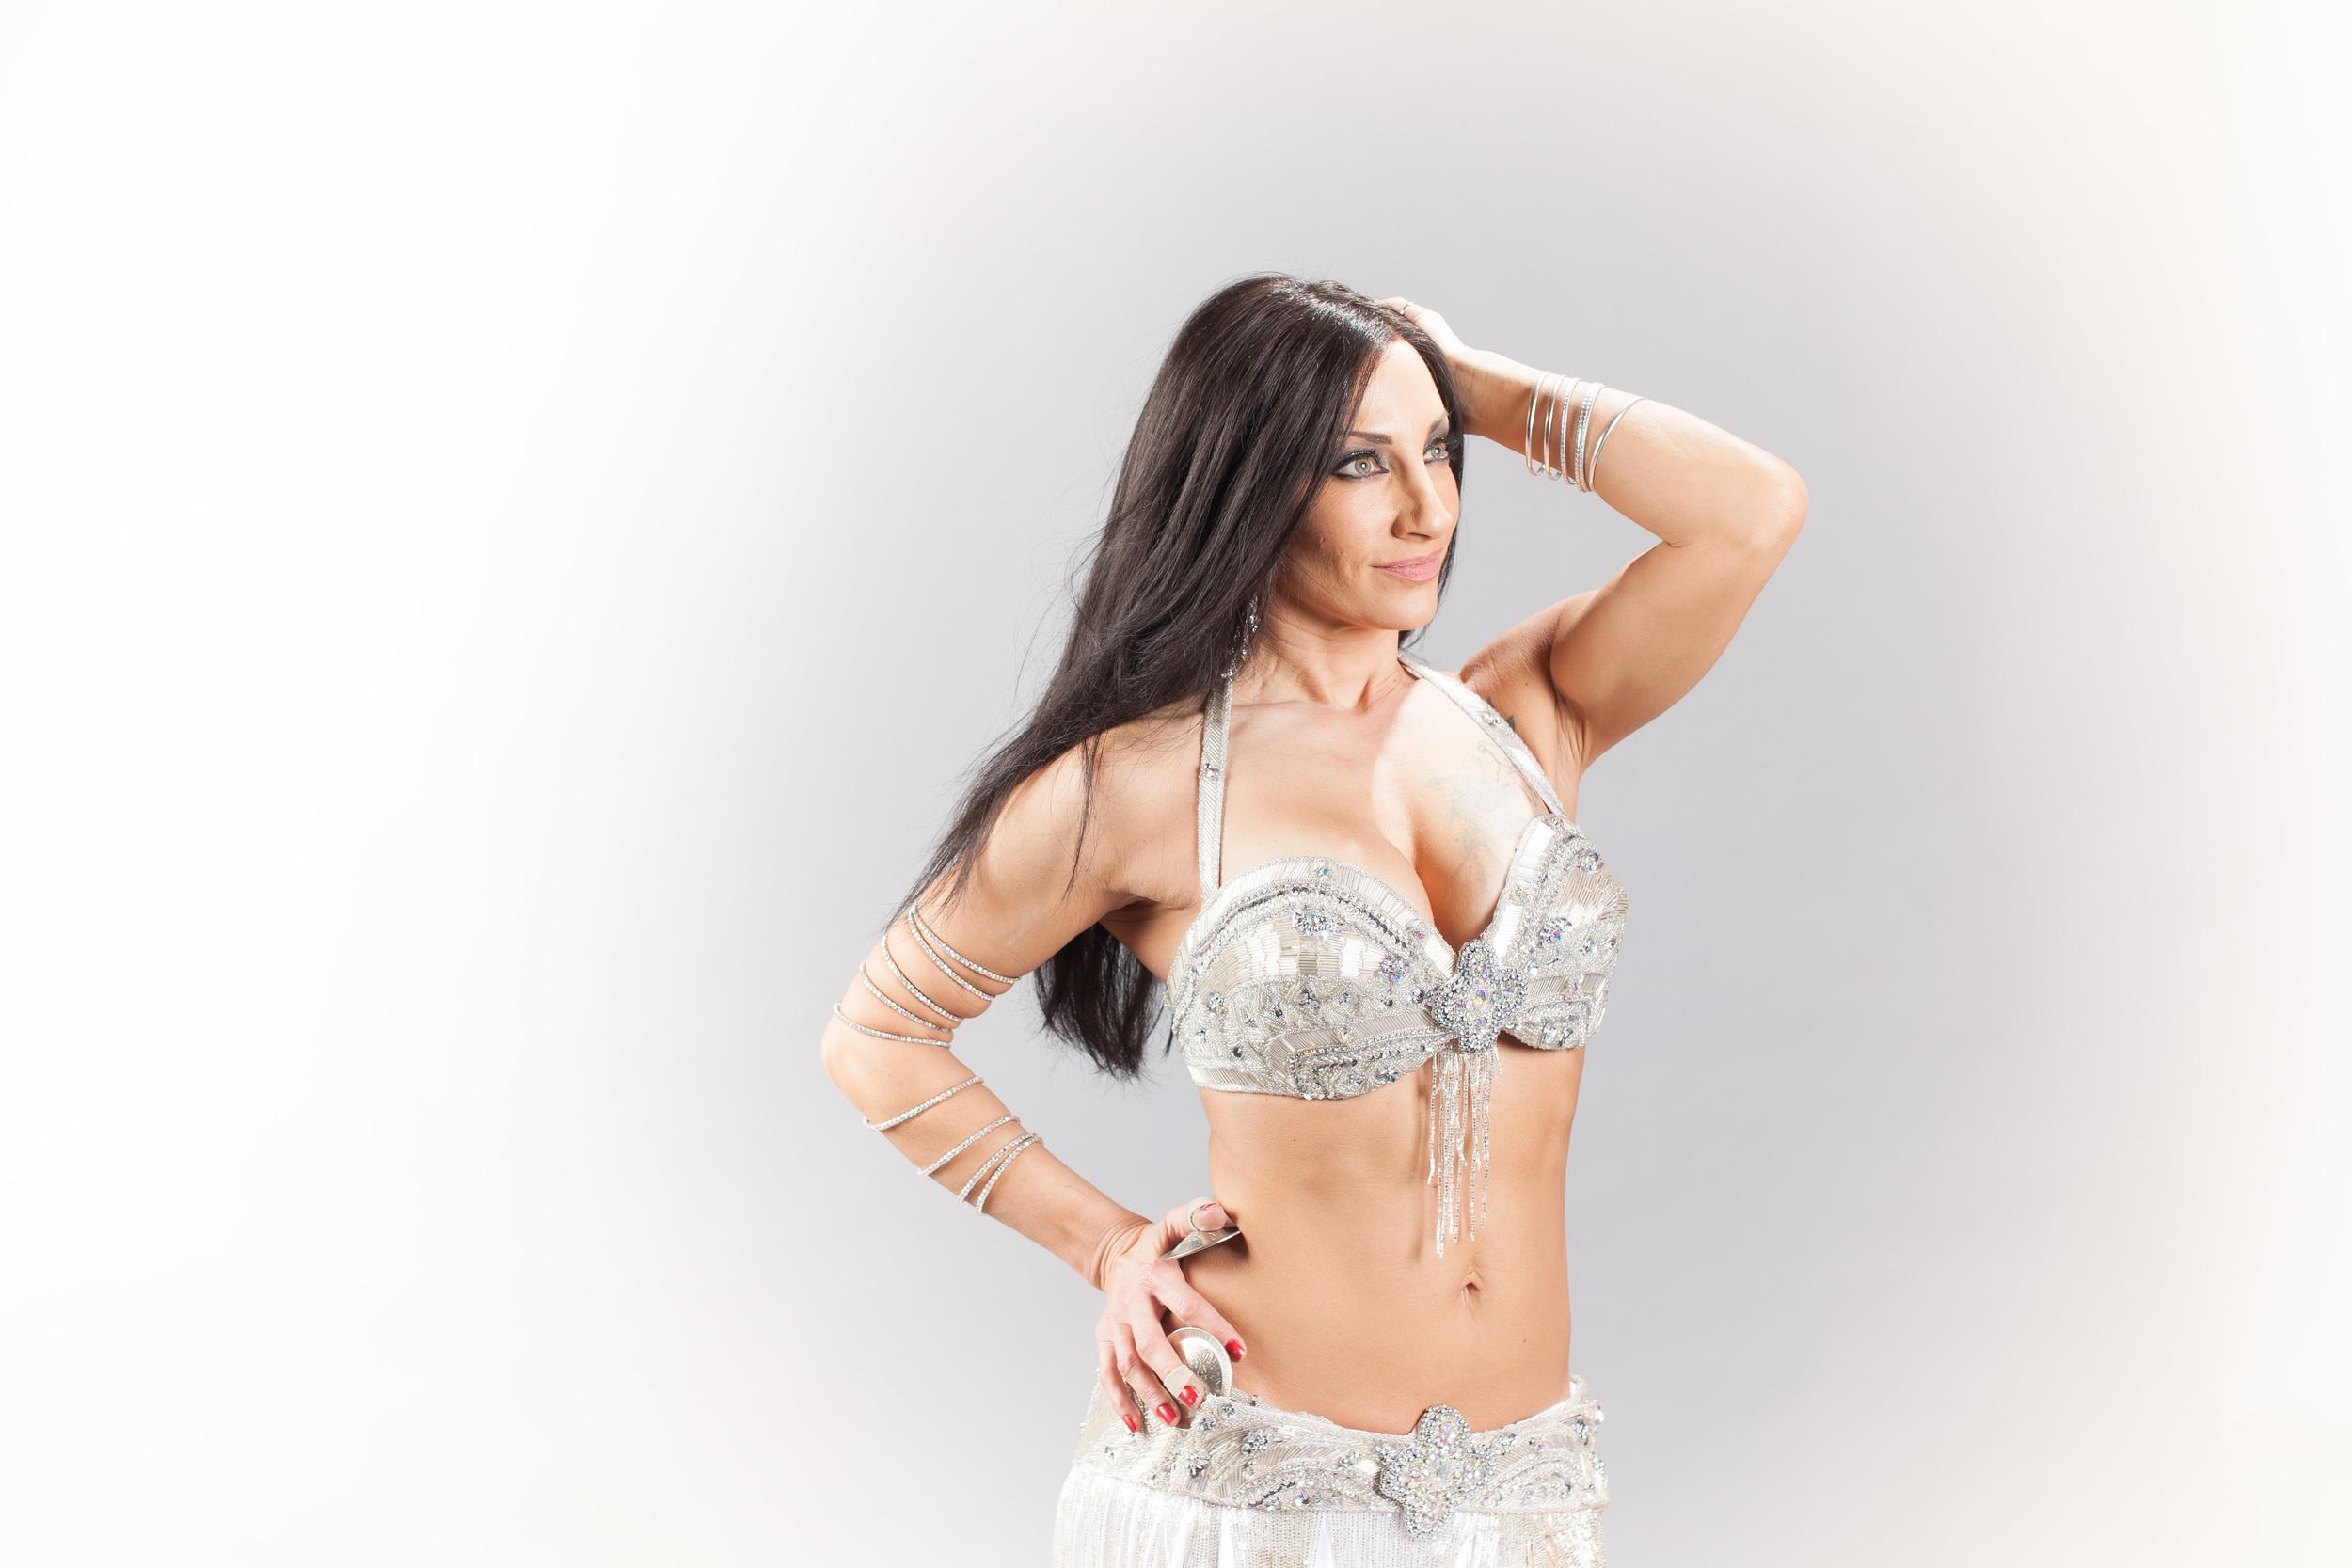 Mahsati Dancer unitymike photo (54 of 235).jpg